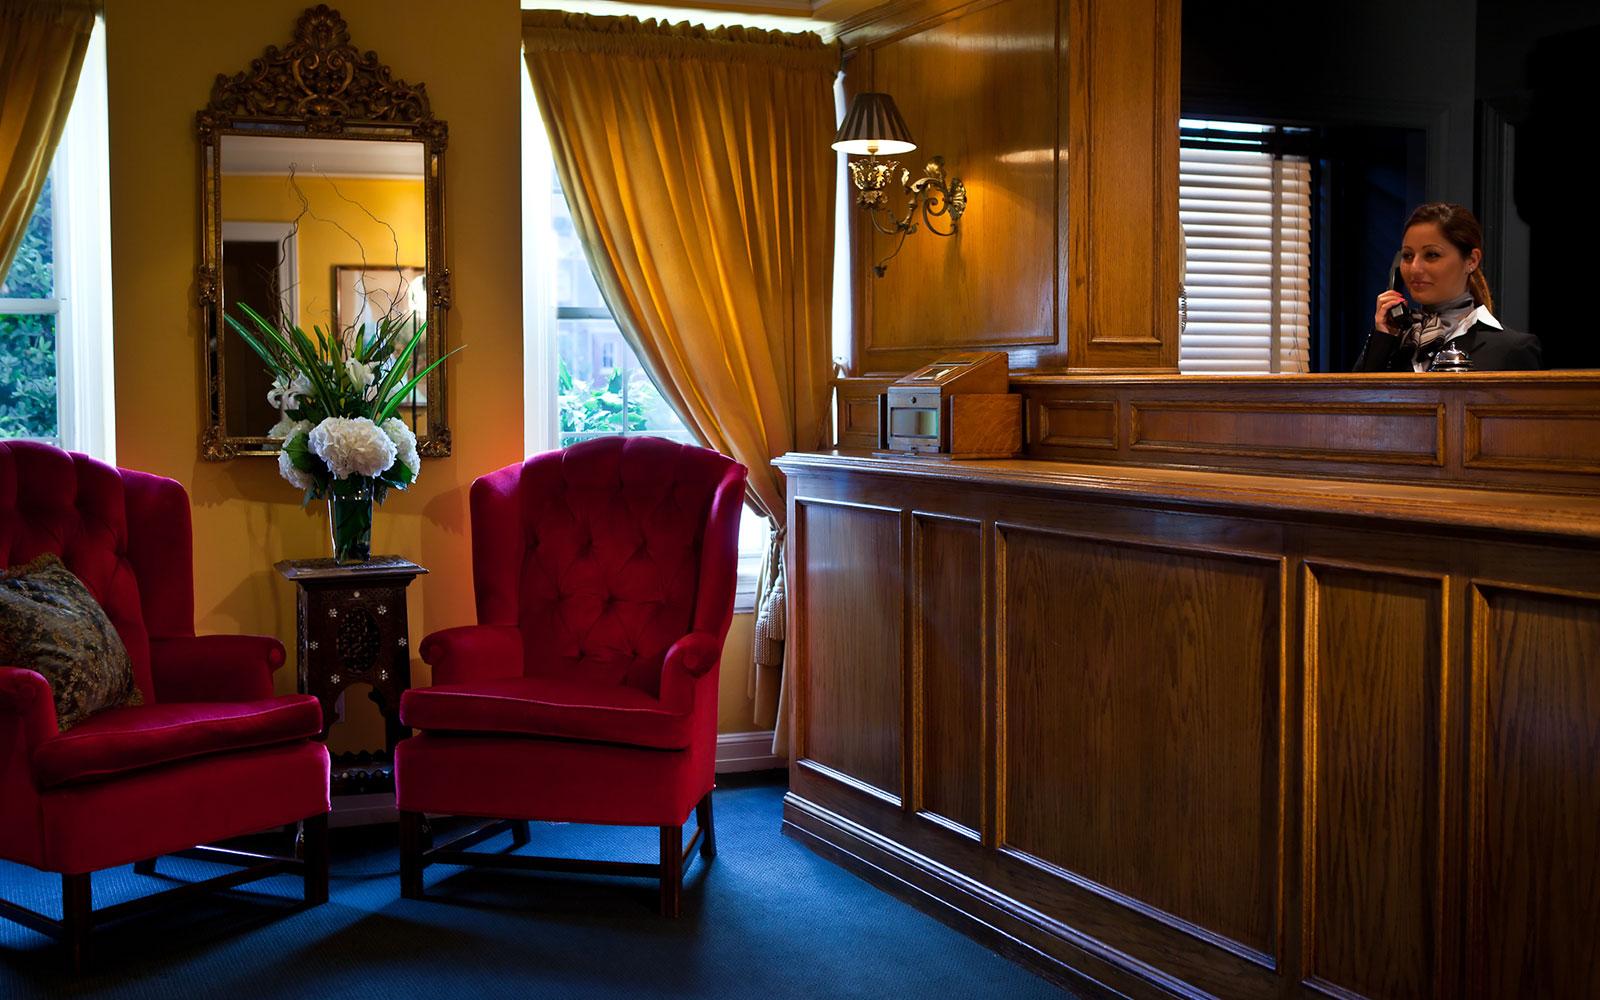 Location of Hotel Lombardy, Washington D.C.